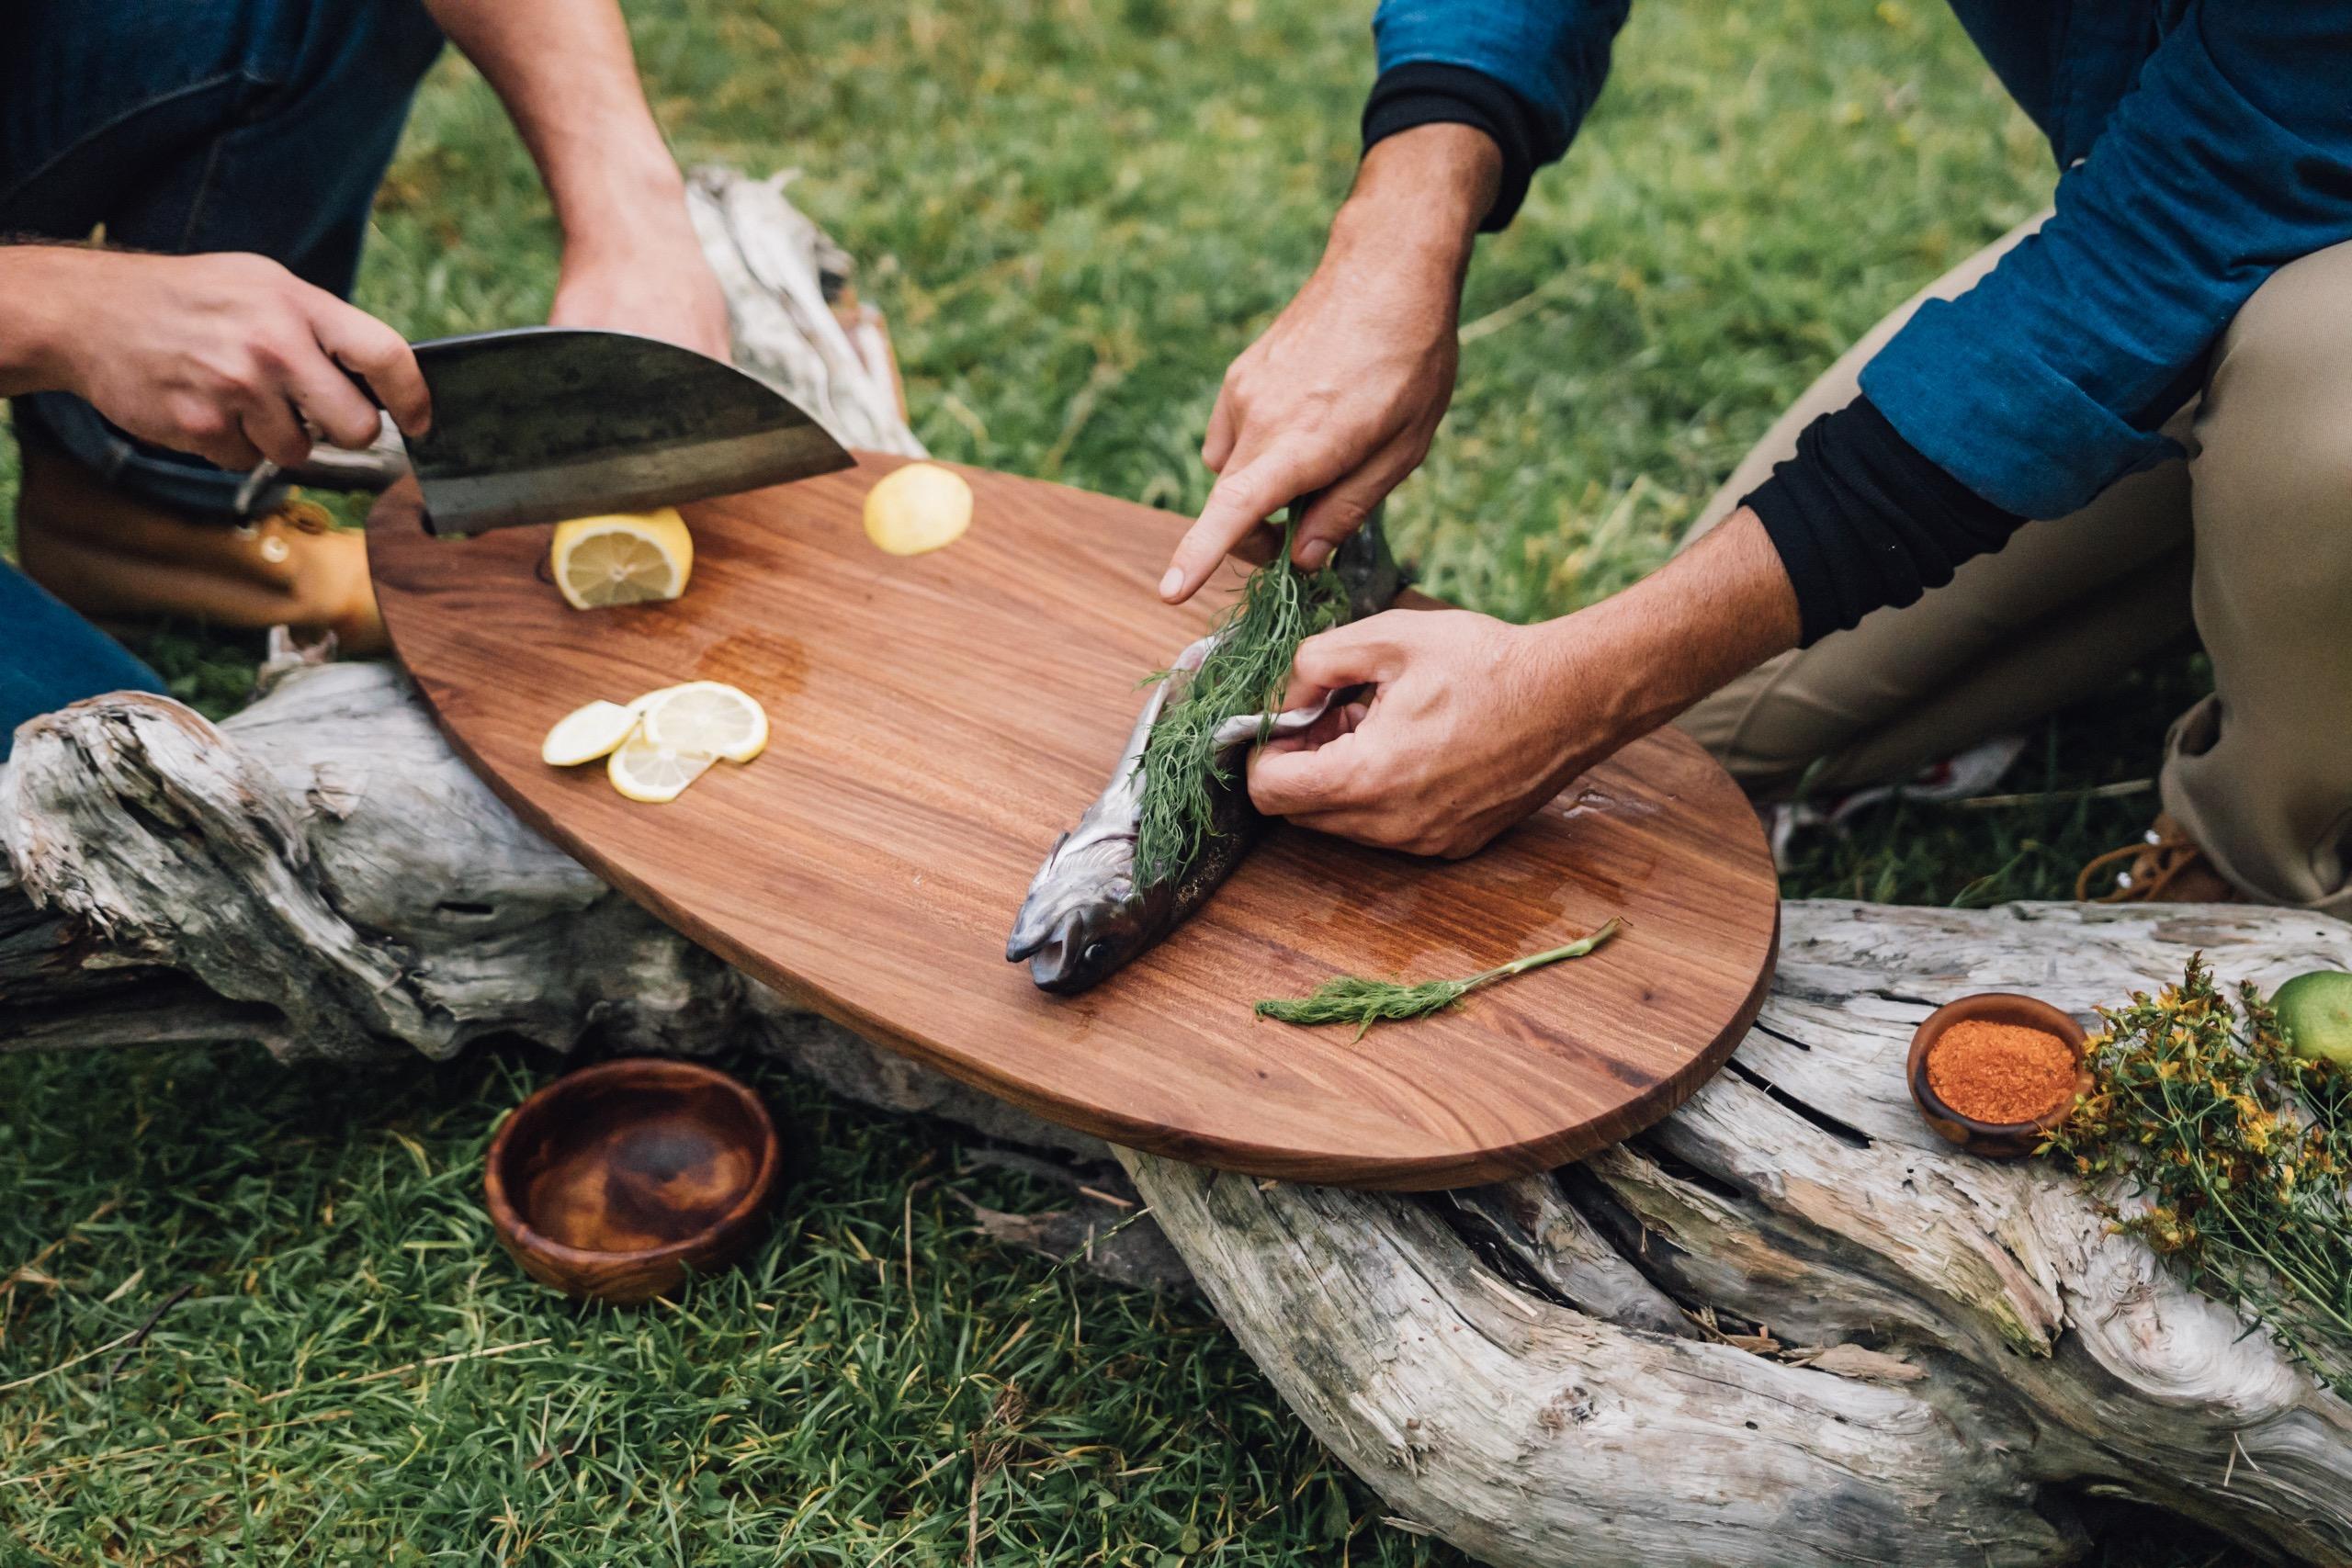 Cooking In The Wild With Skoda And Almazan Kitchen Lake Skoda Storyboard